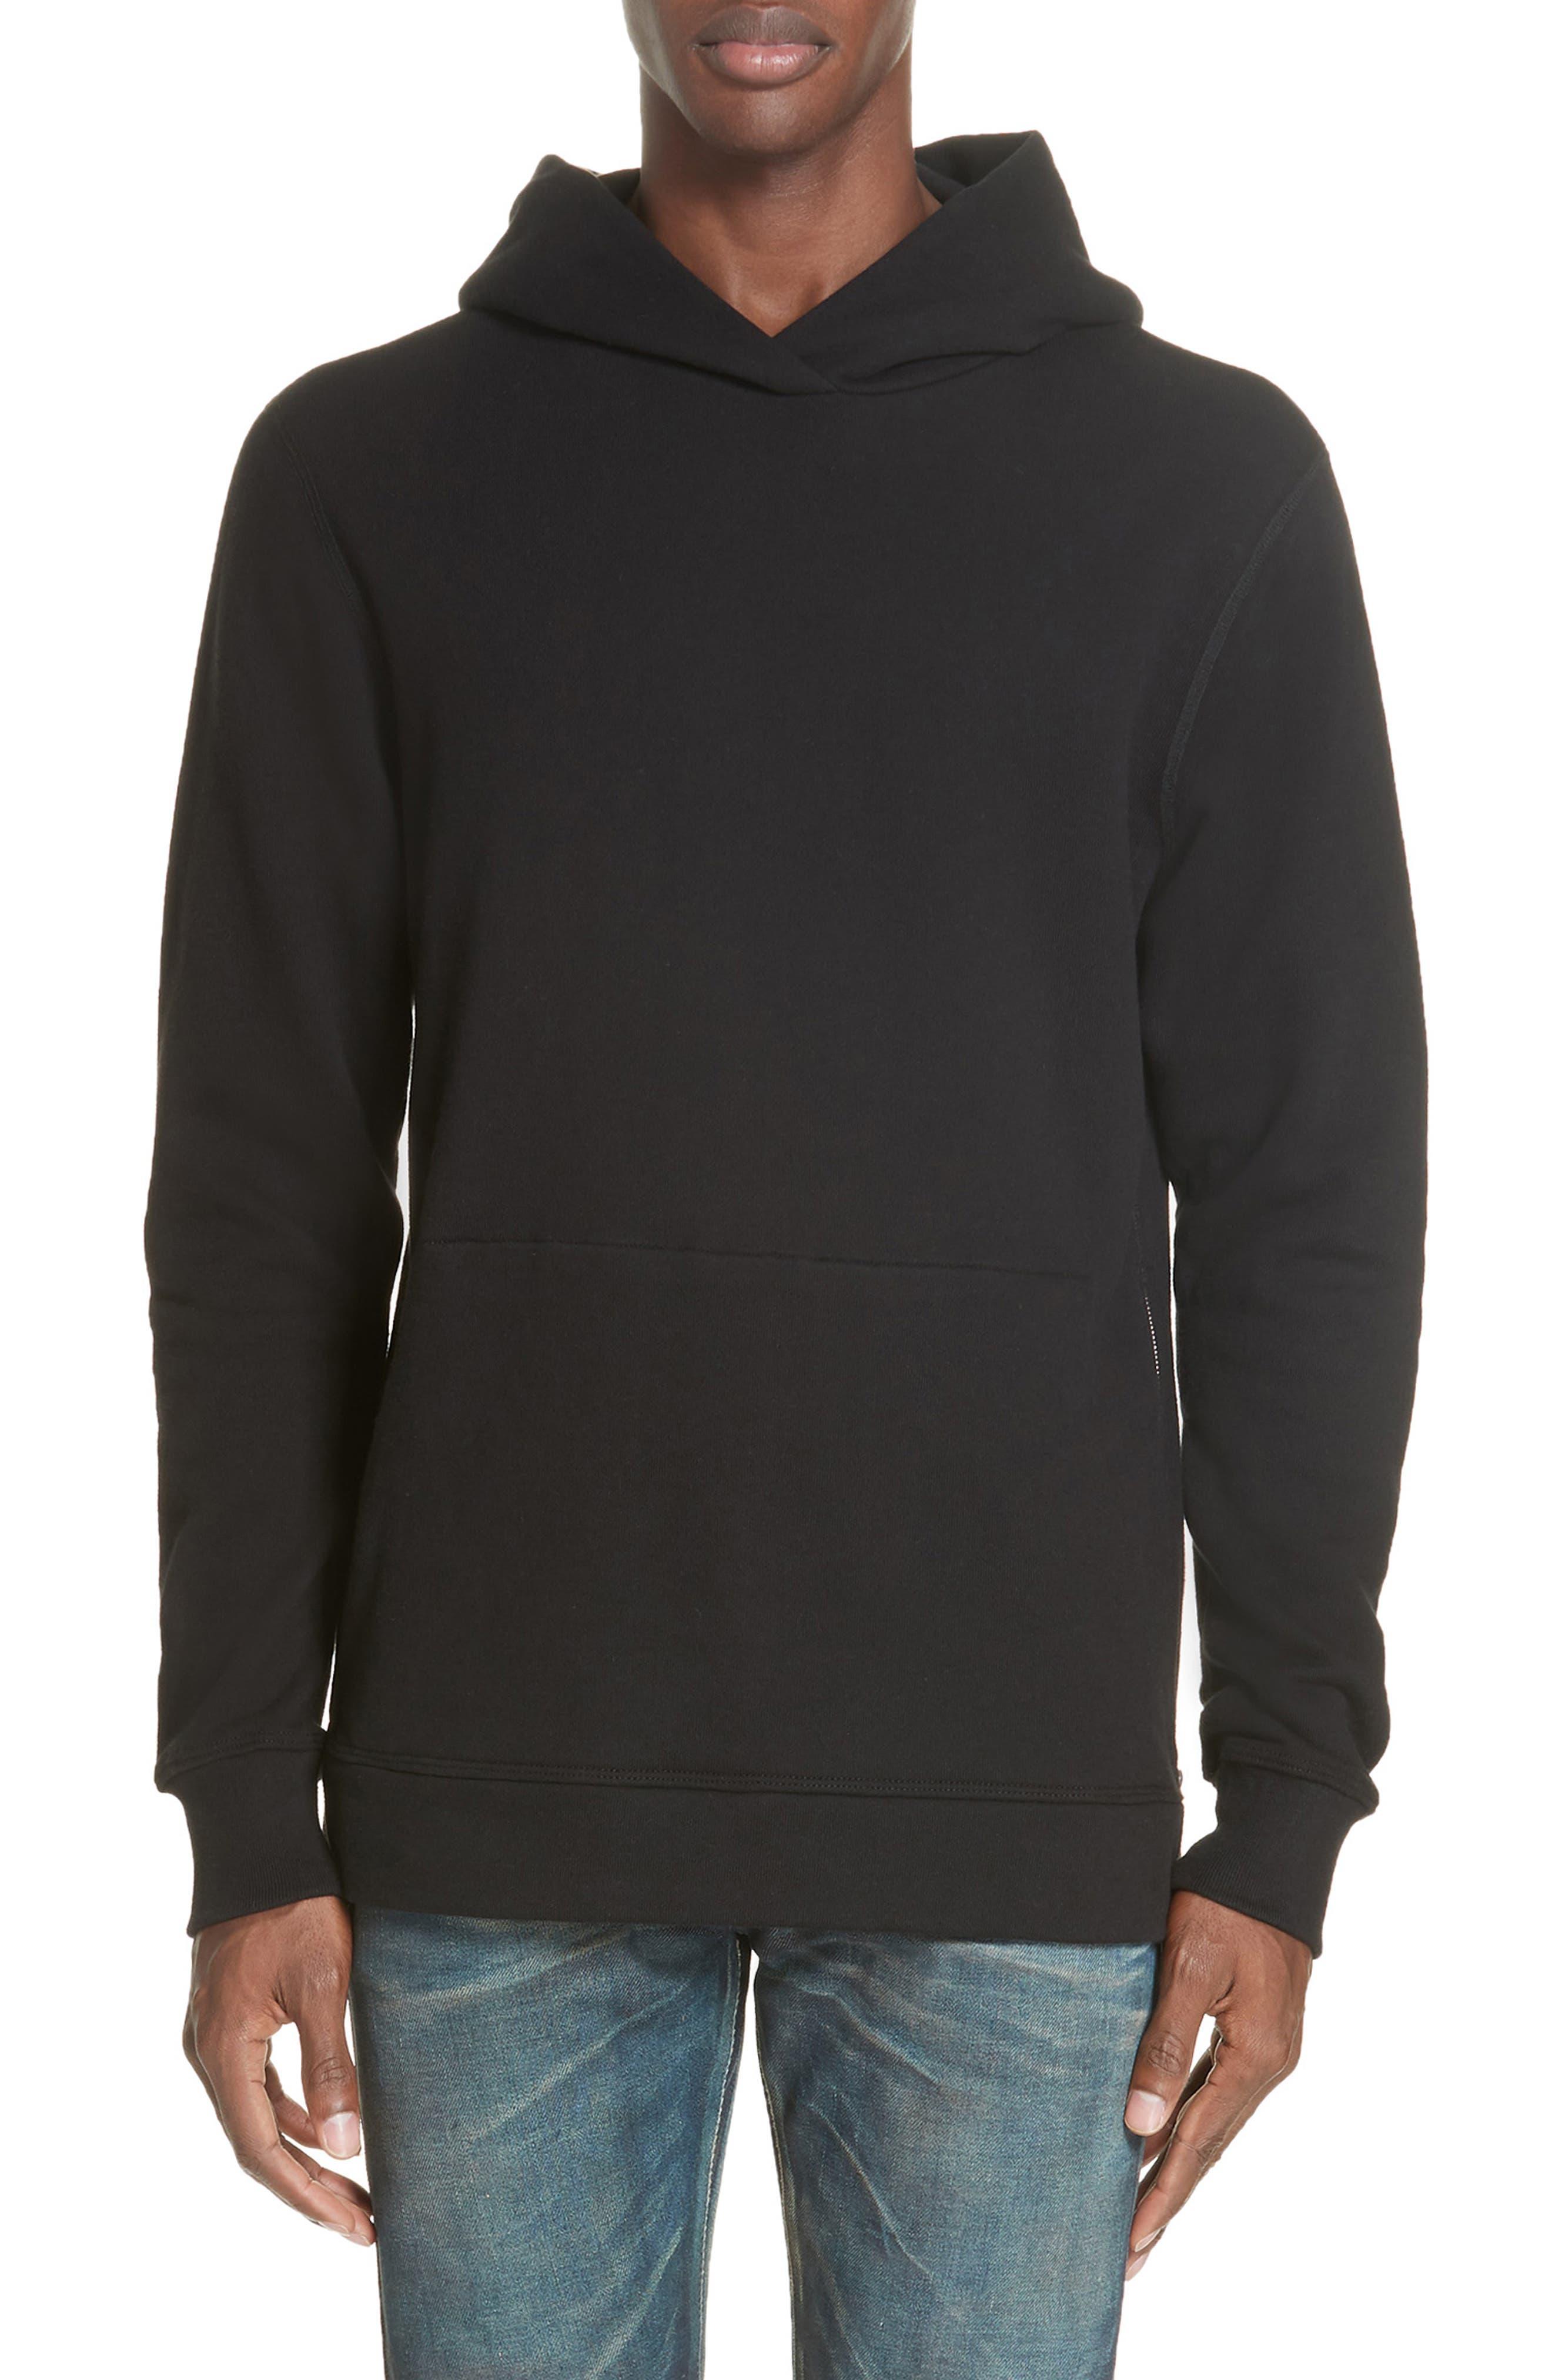 JOHN ELLIOTT, Hooded Villain Sweatshirt, Main thumbnail 1, color, BLACK